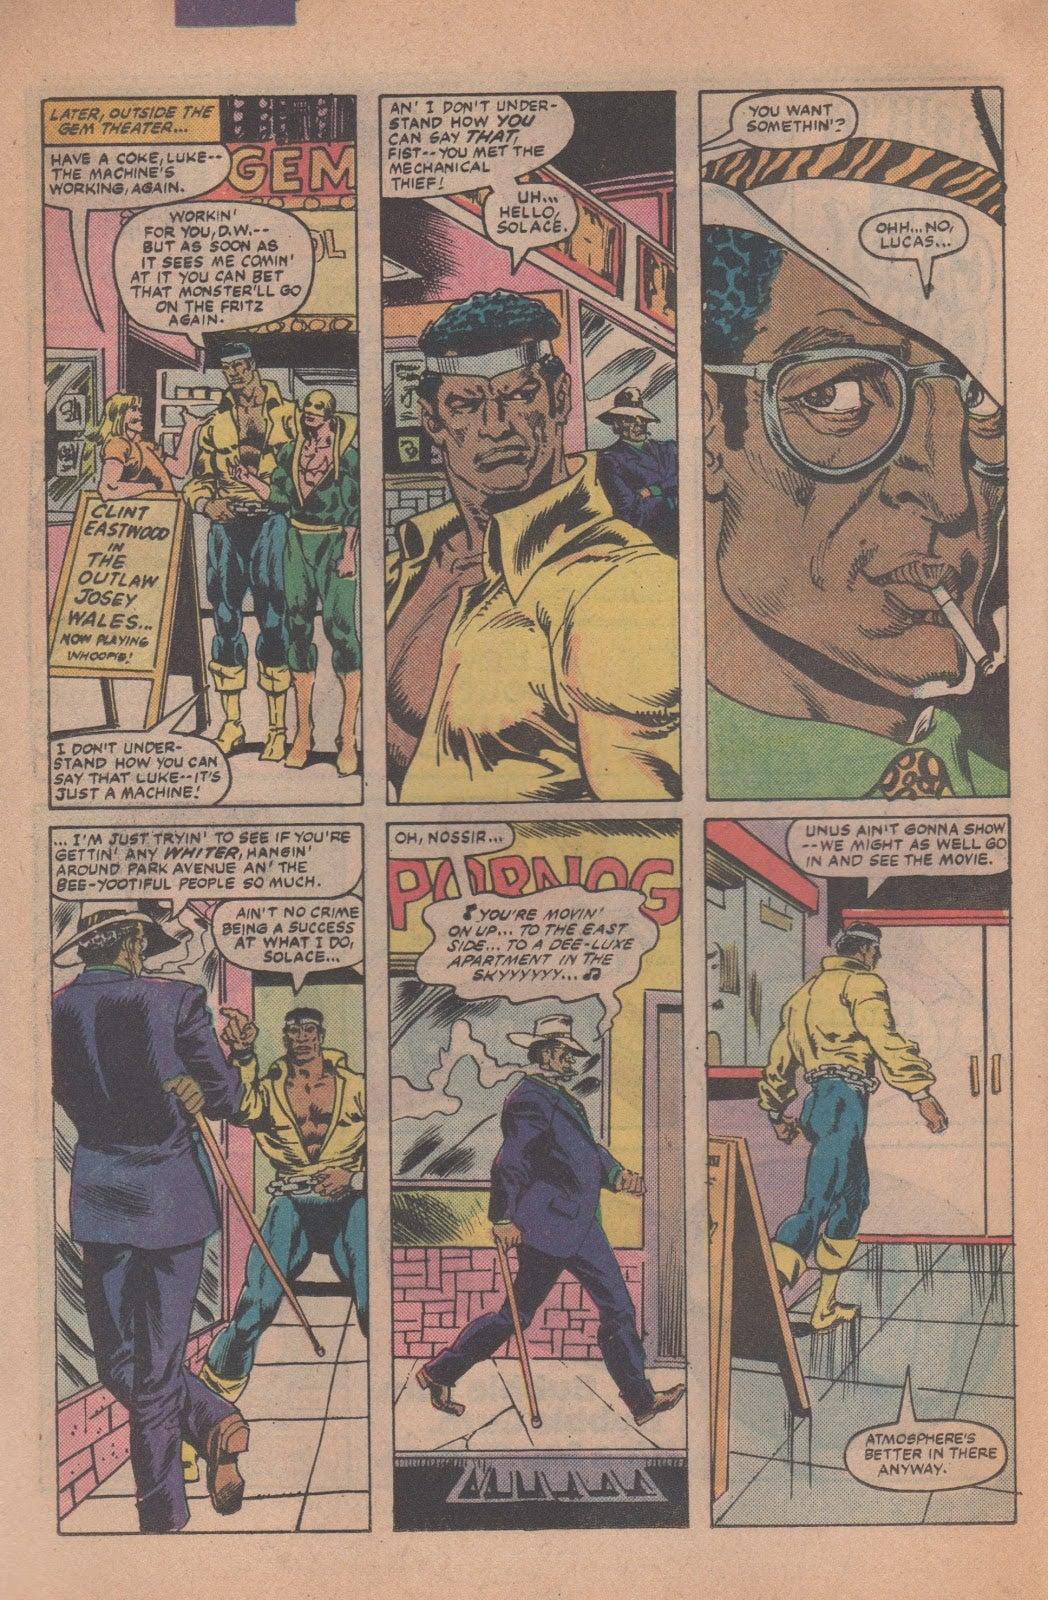 Marvel's Best Superhero Friendship Comes Back This Week